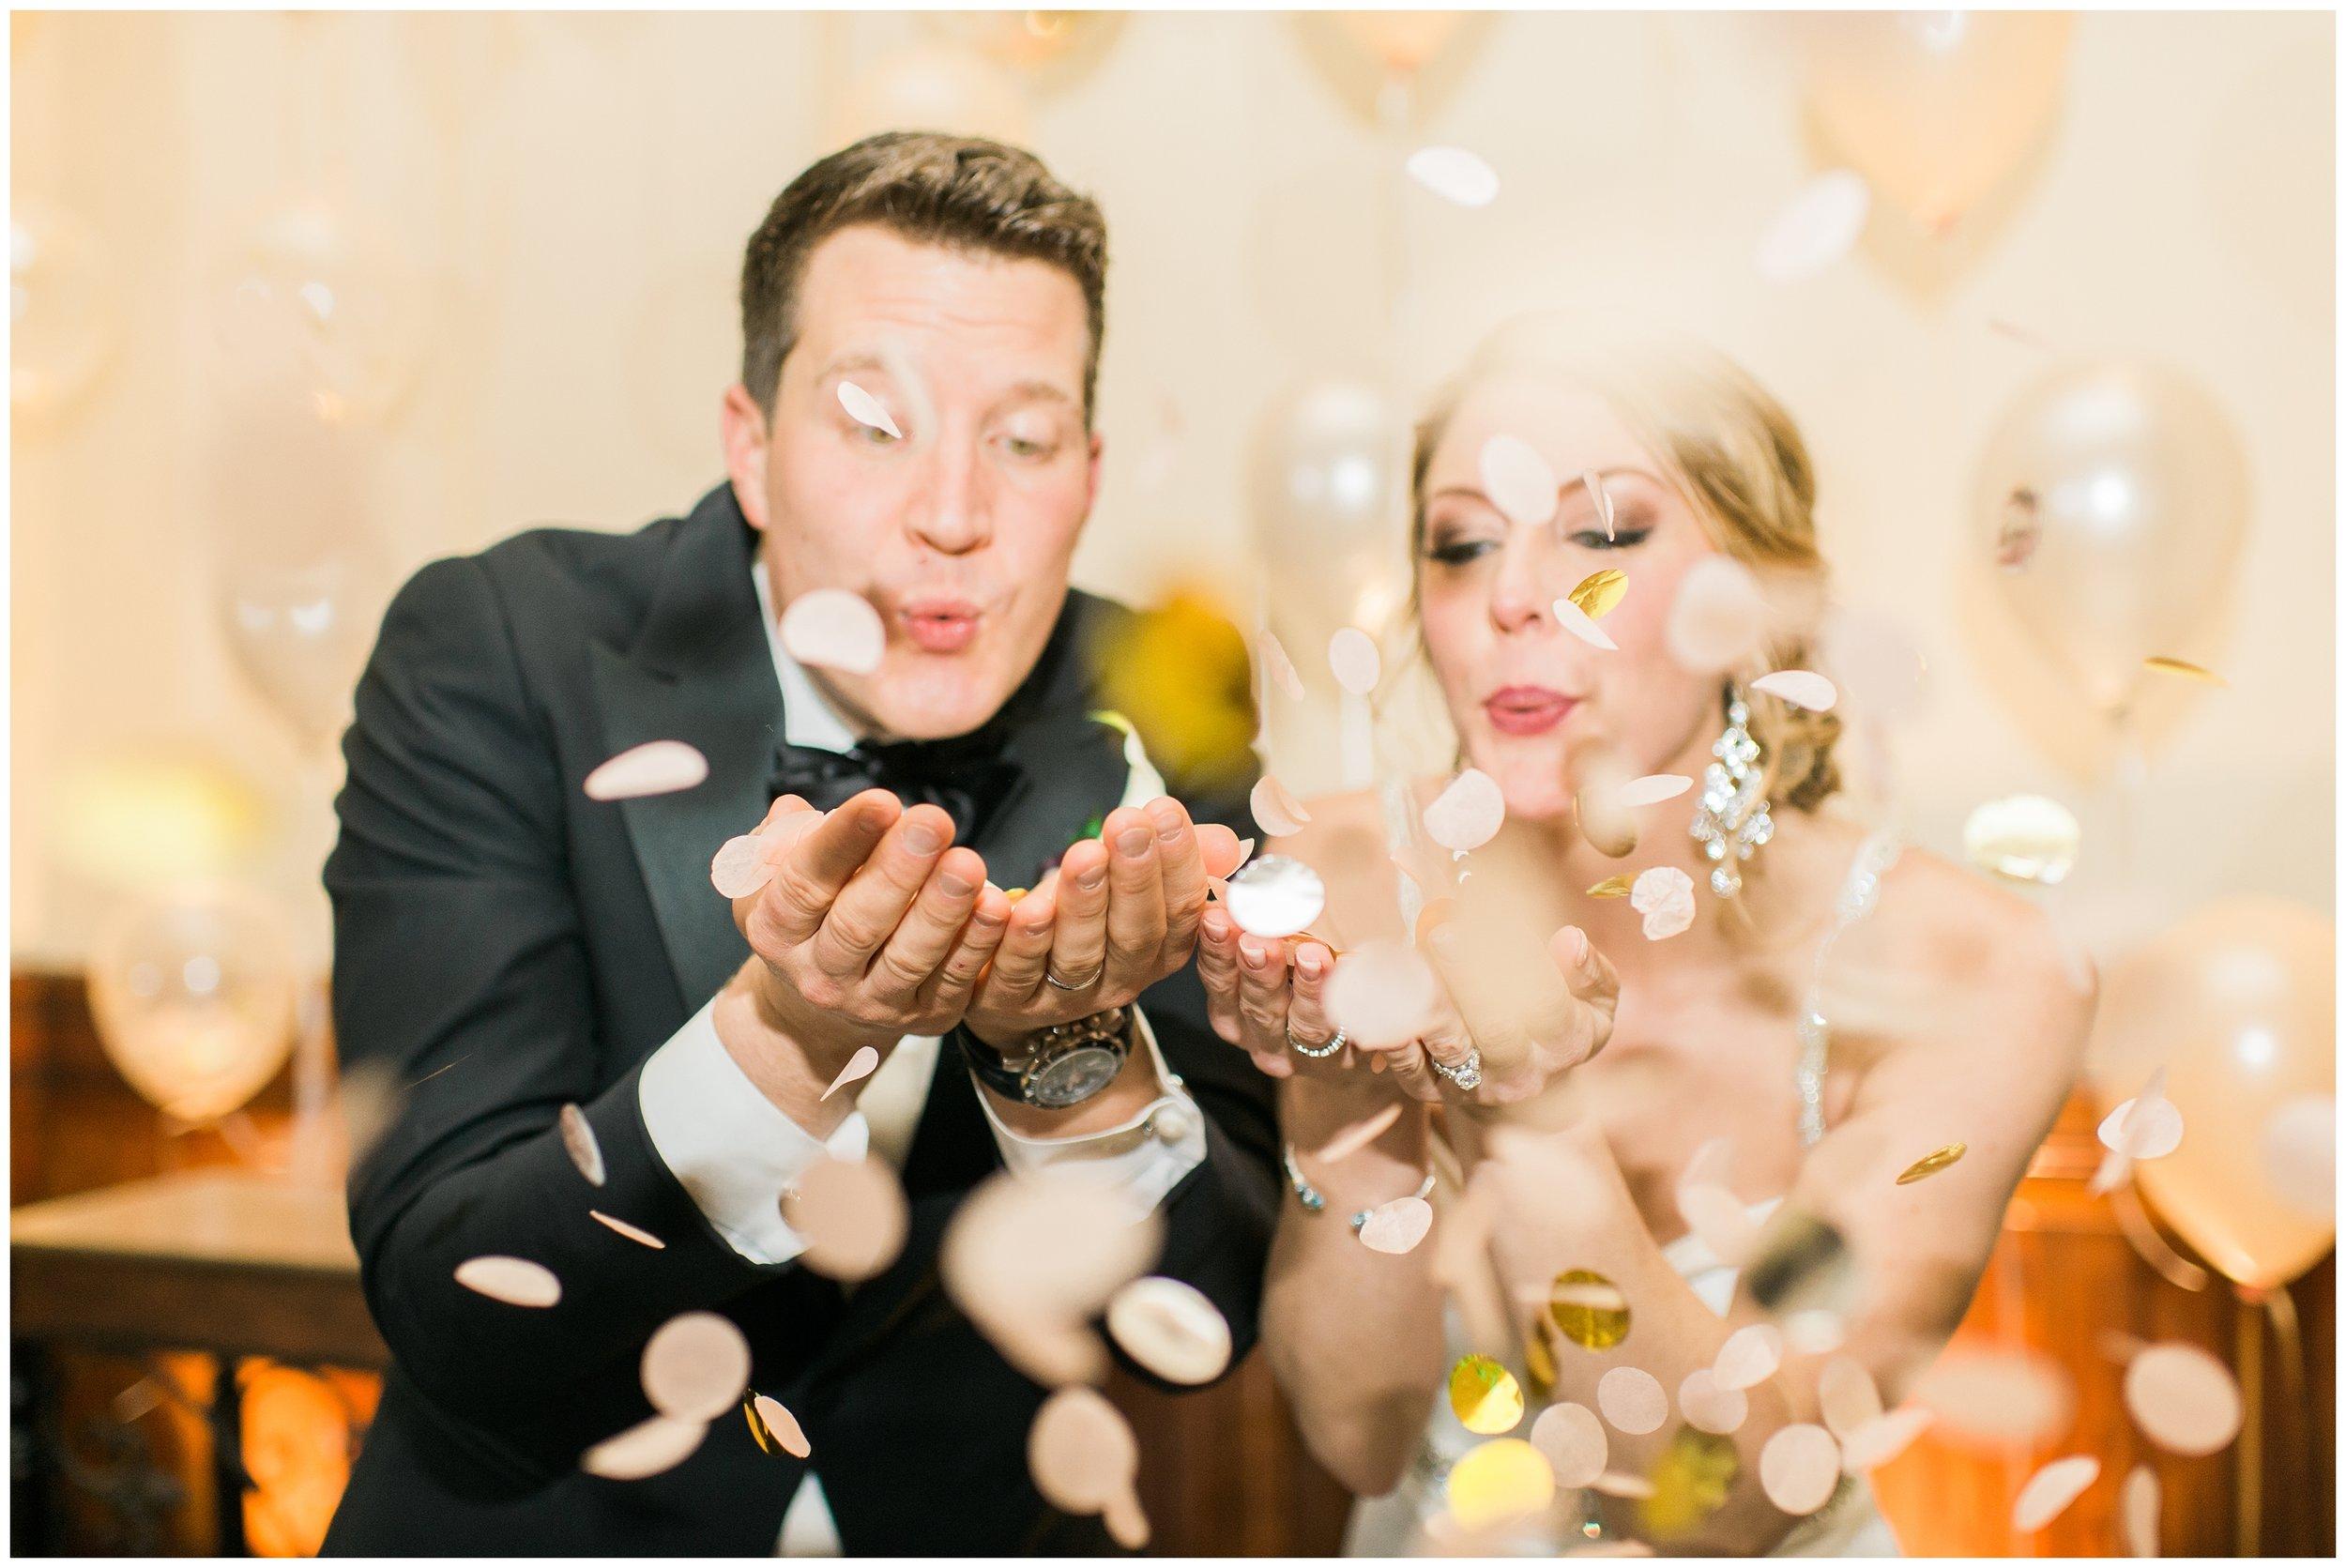 Rebecca_Bridges_Photography_Indianapolis_Wedding_Photographer_5866.jpg